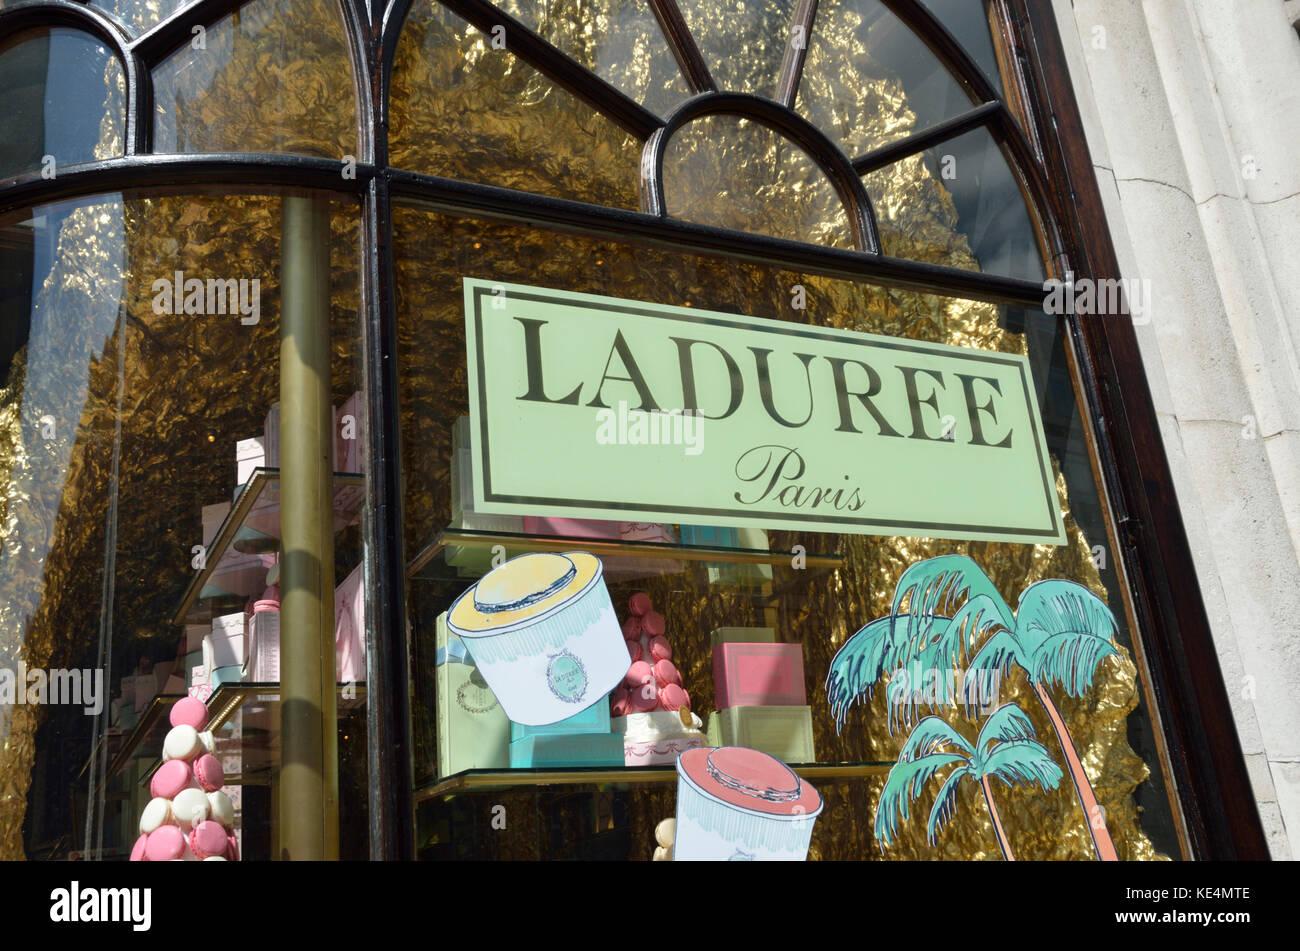 Laduree patisserie bakery in Burlington Arcade, London, UK. - Stock Image